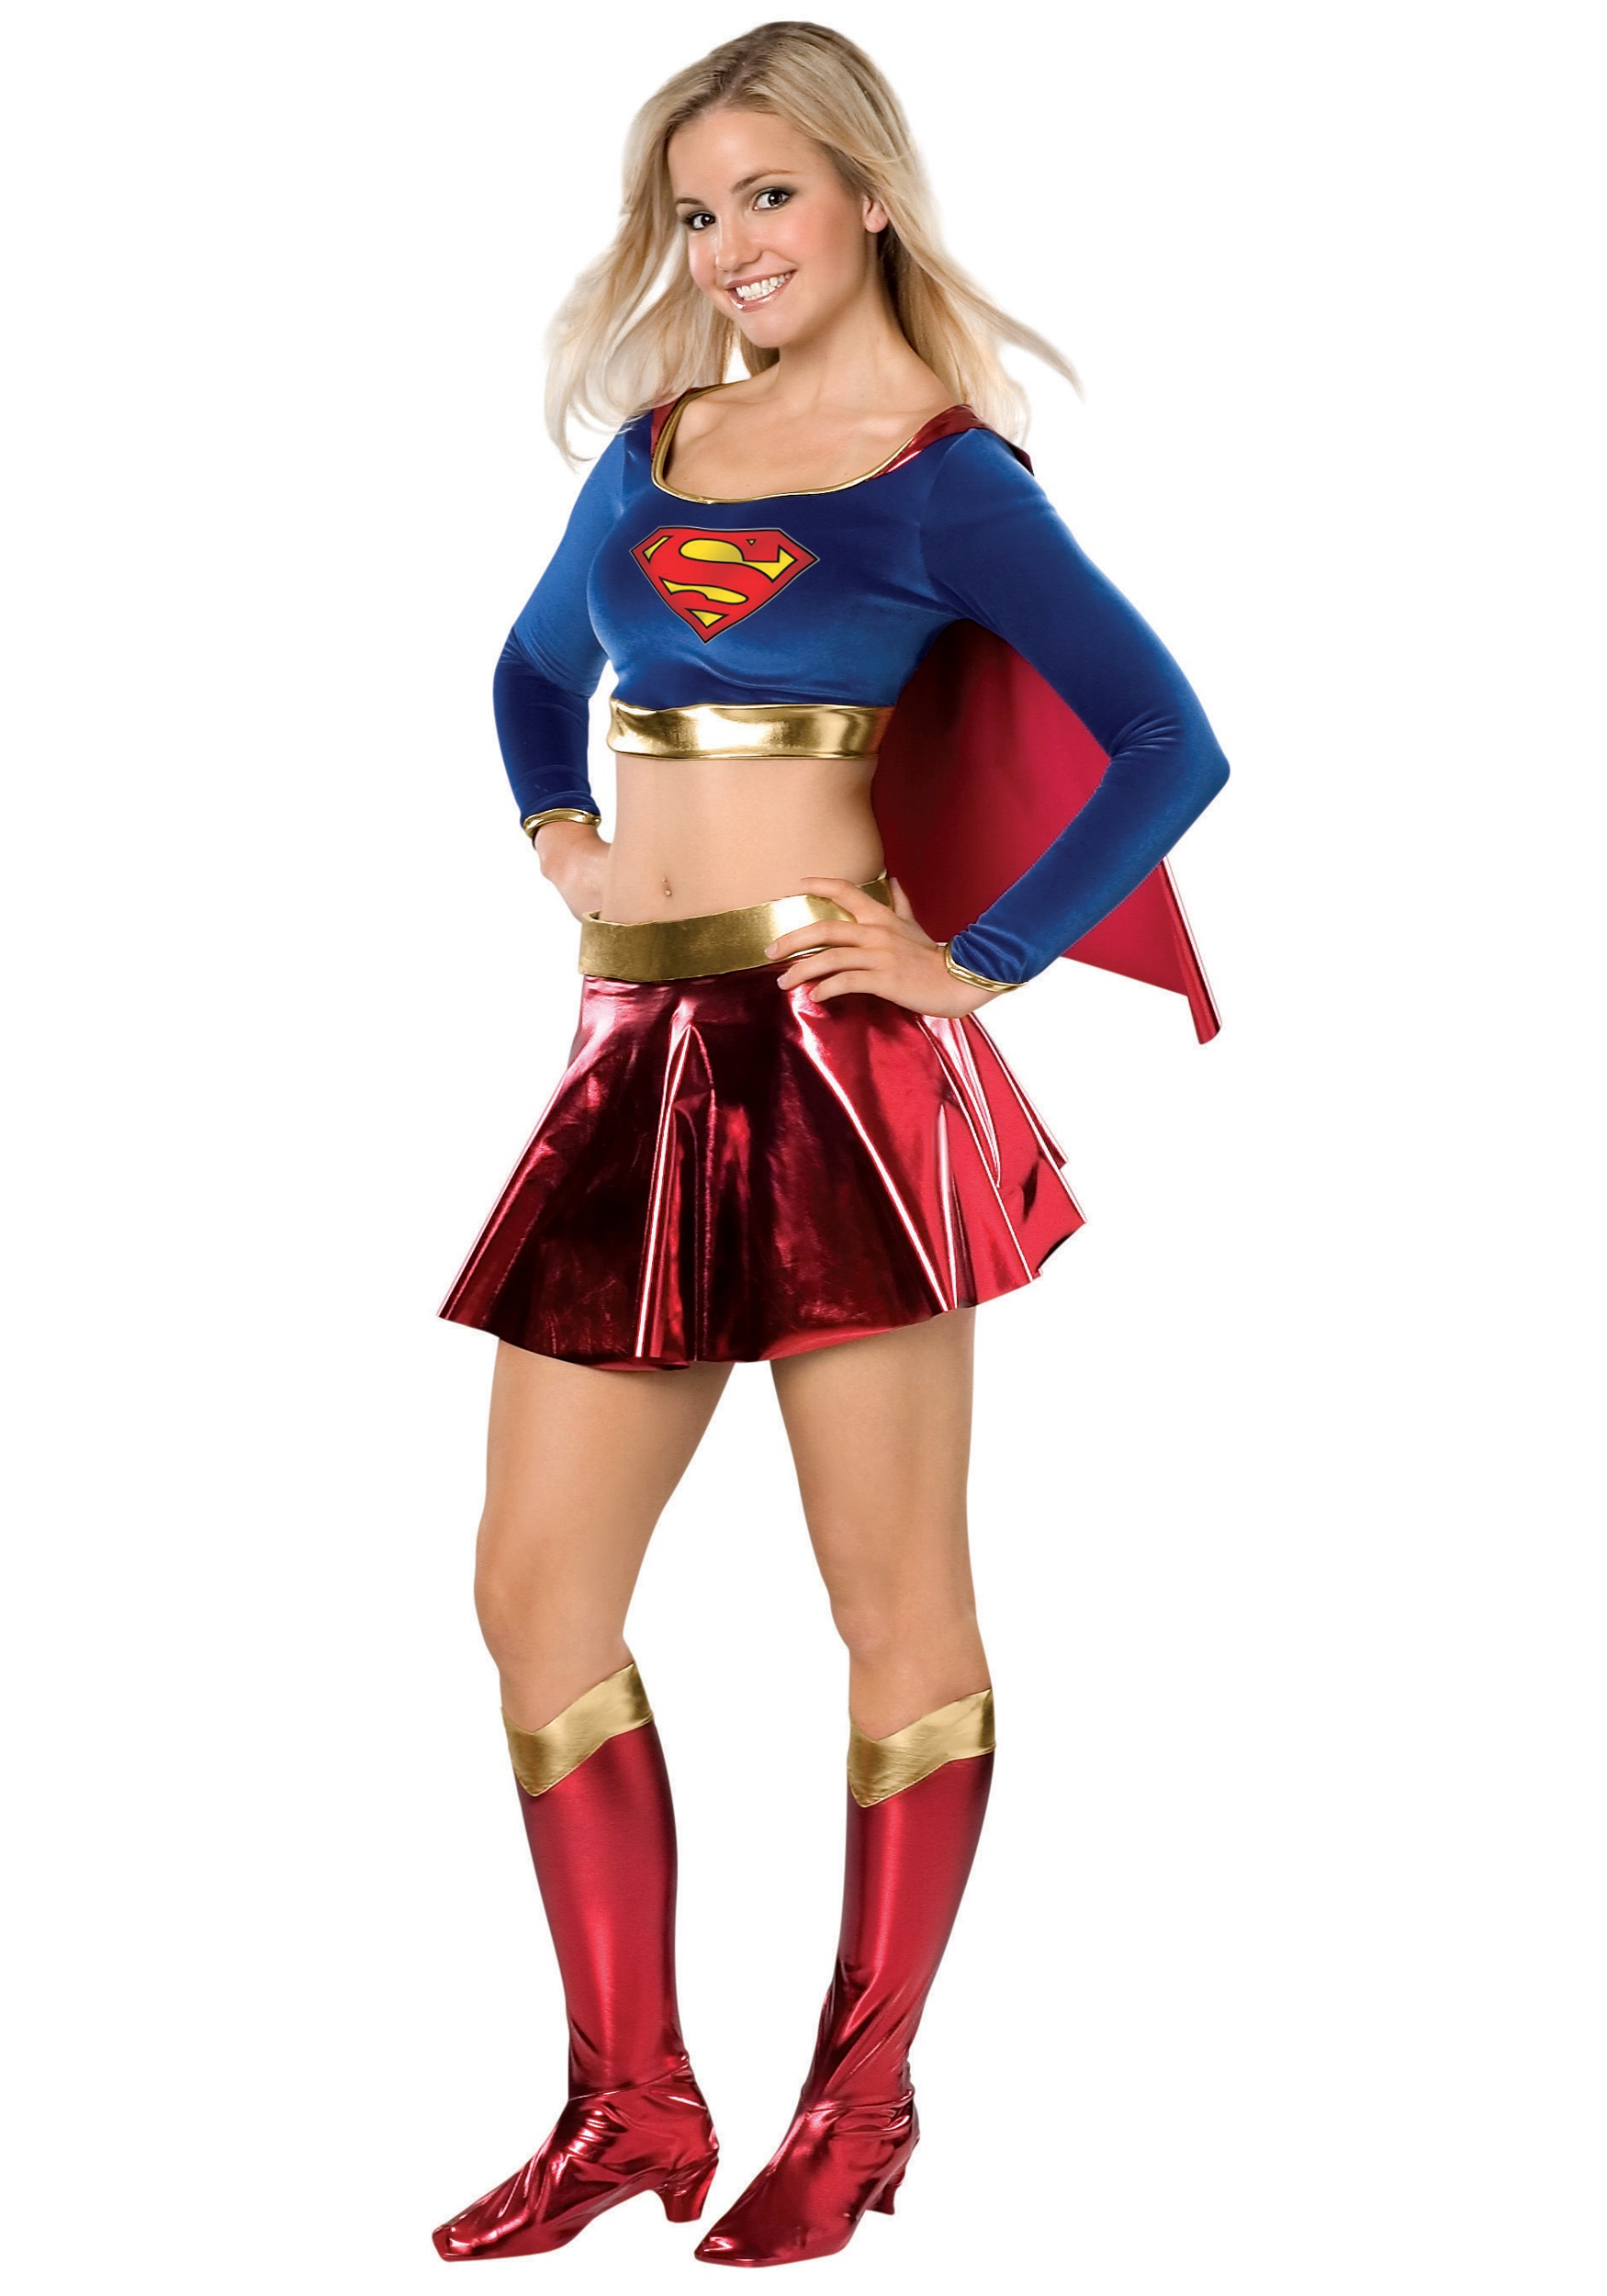 Teen Supergirl Costume  sc 1 st  Halloween Costumes & Teen Supergirl Costume - Halloween Costumes